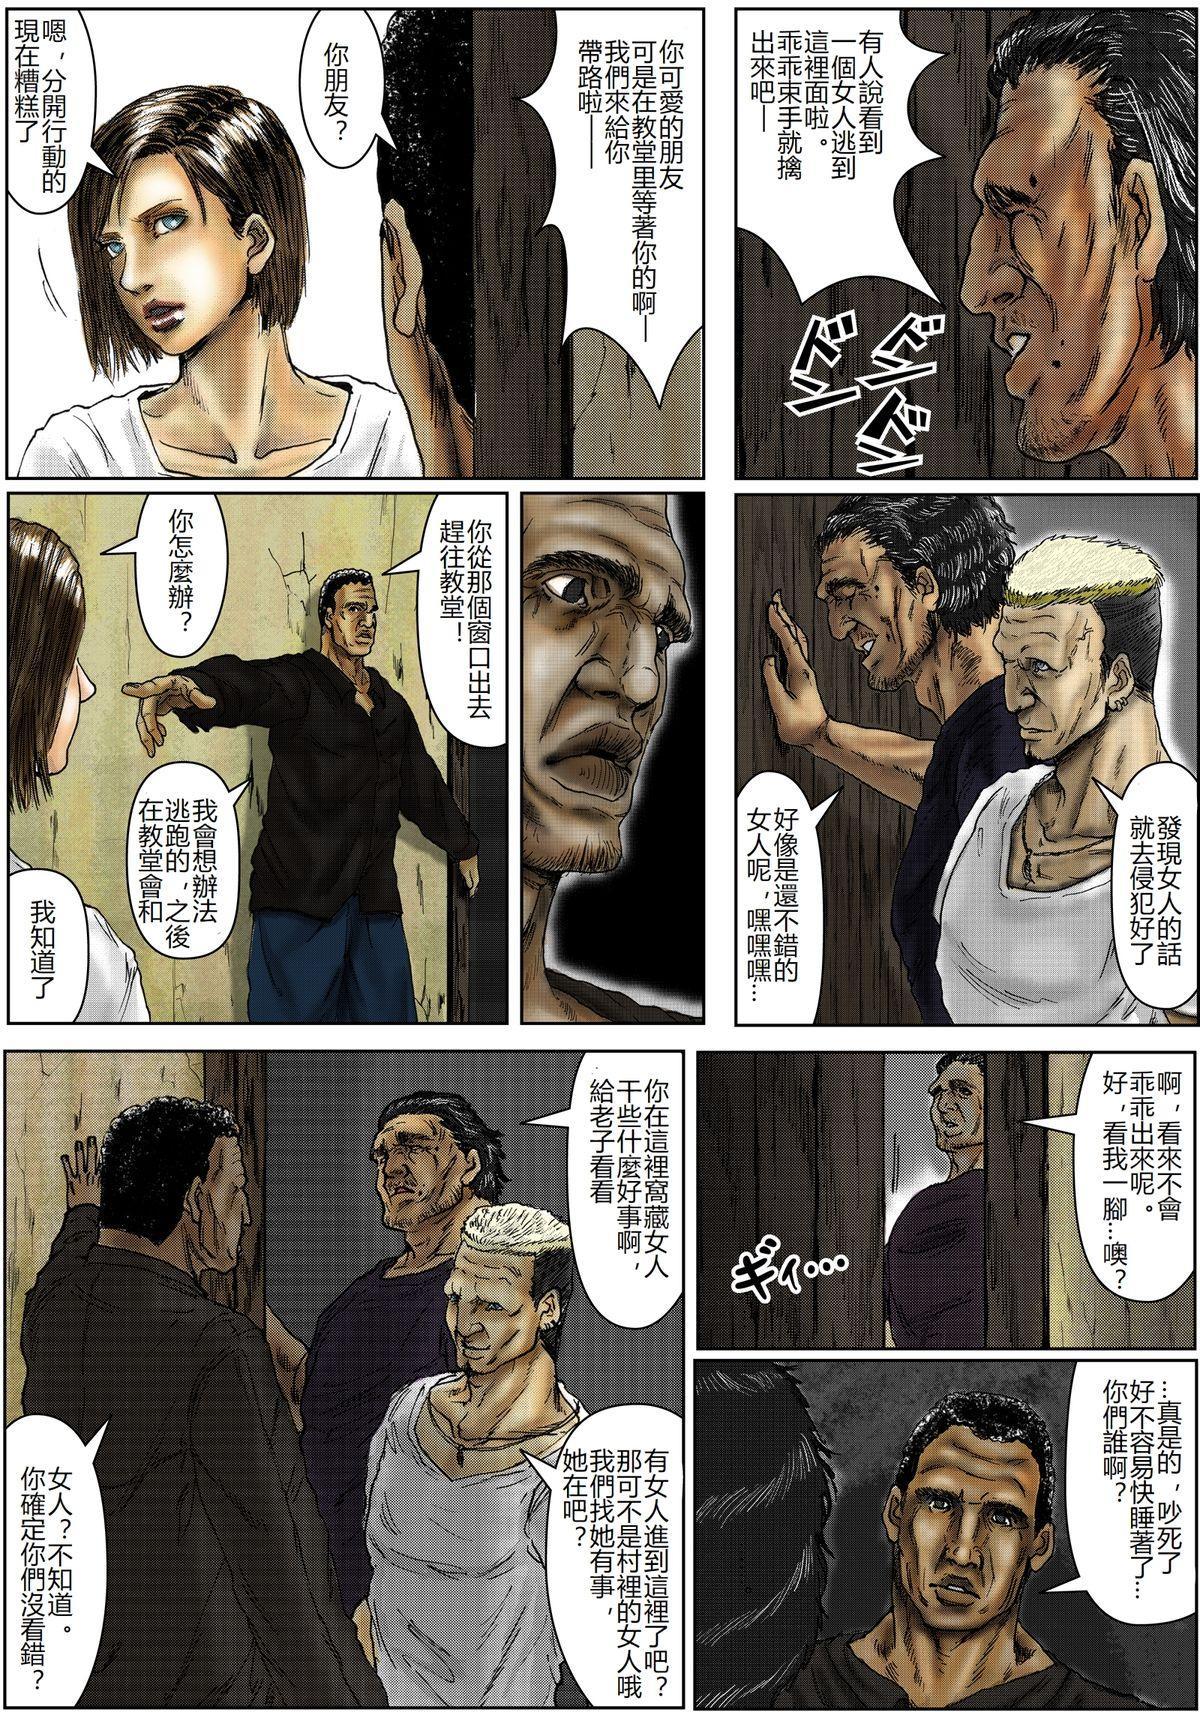 BODY HAZARD 5 Shushou Hen 4